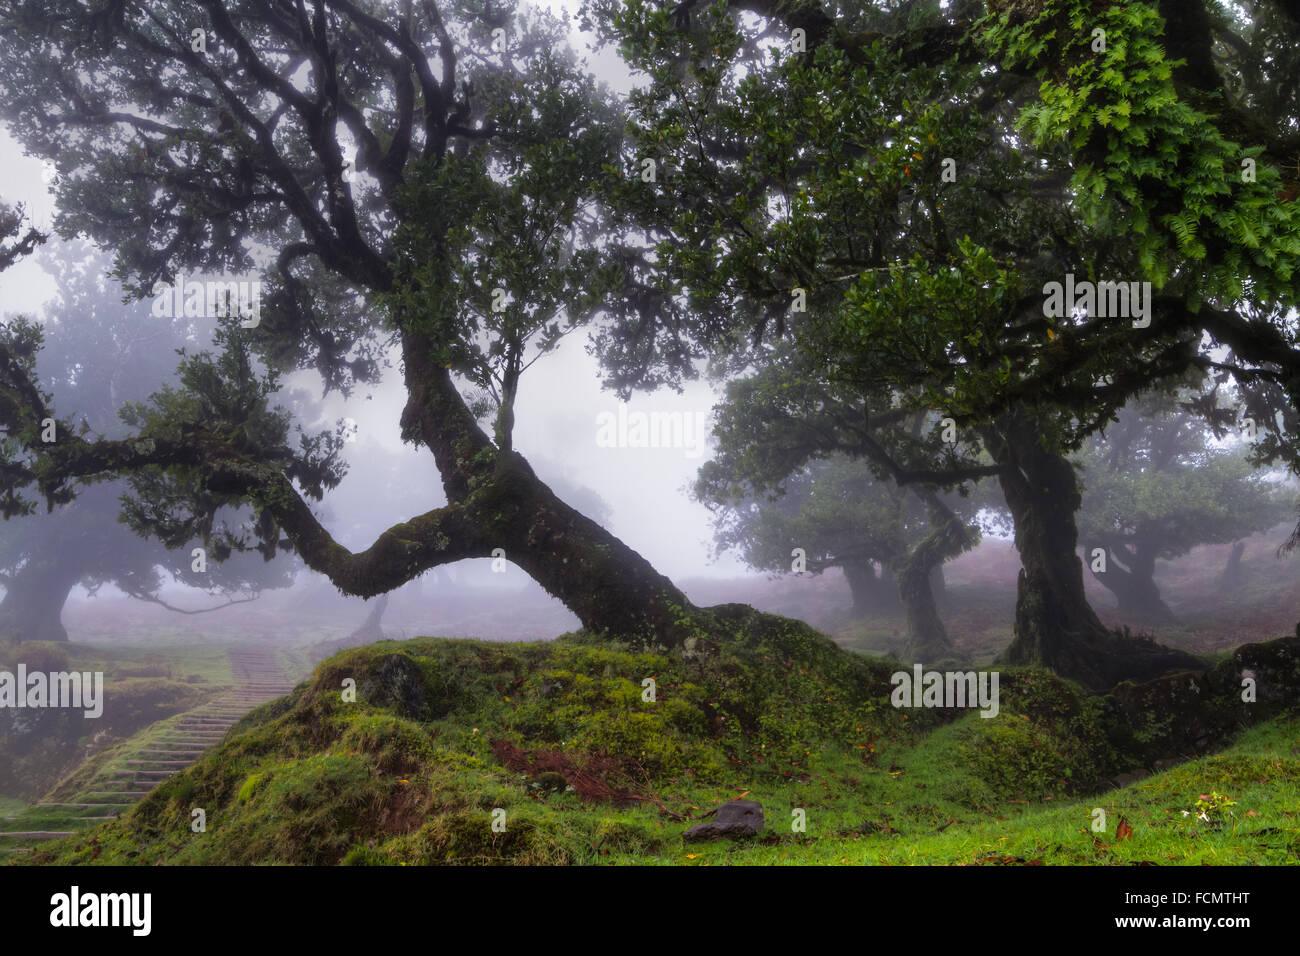 Alten Lorbeerwald im Nebel, Madeira, Portugal Stockbild